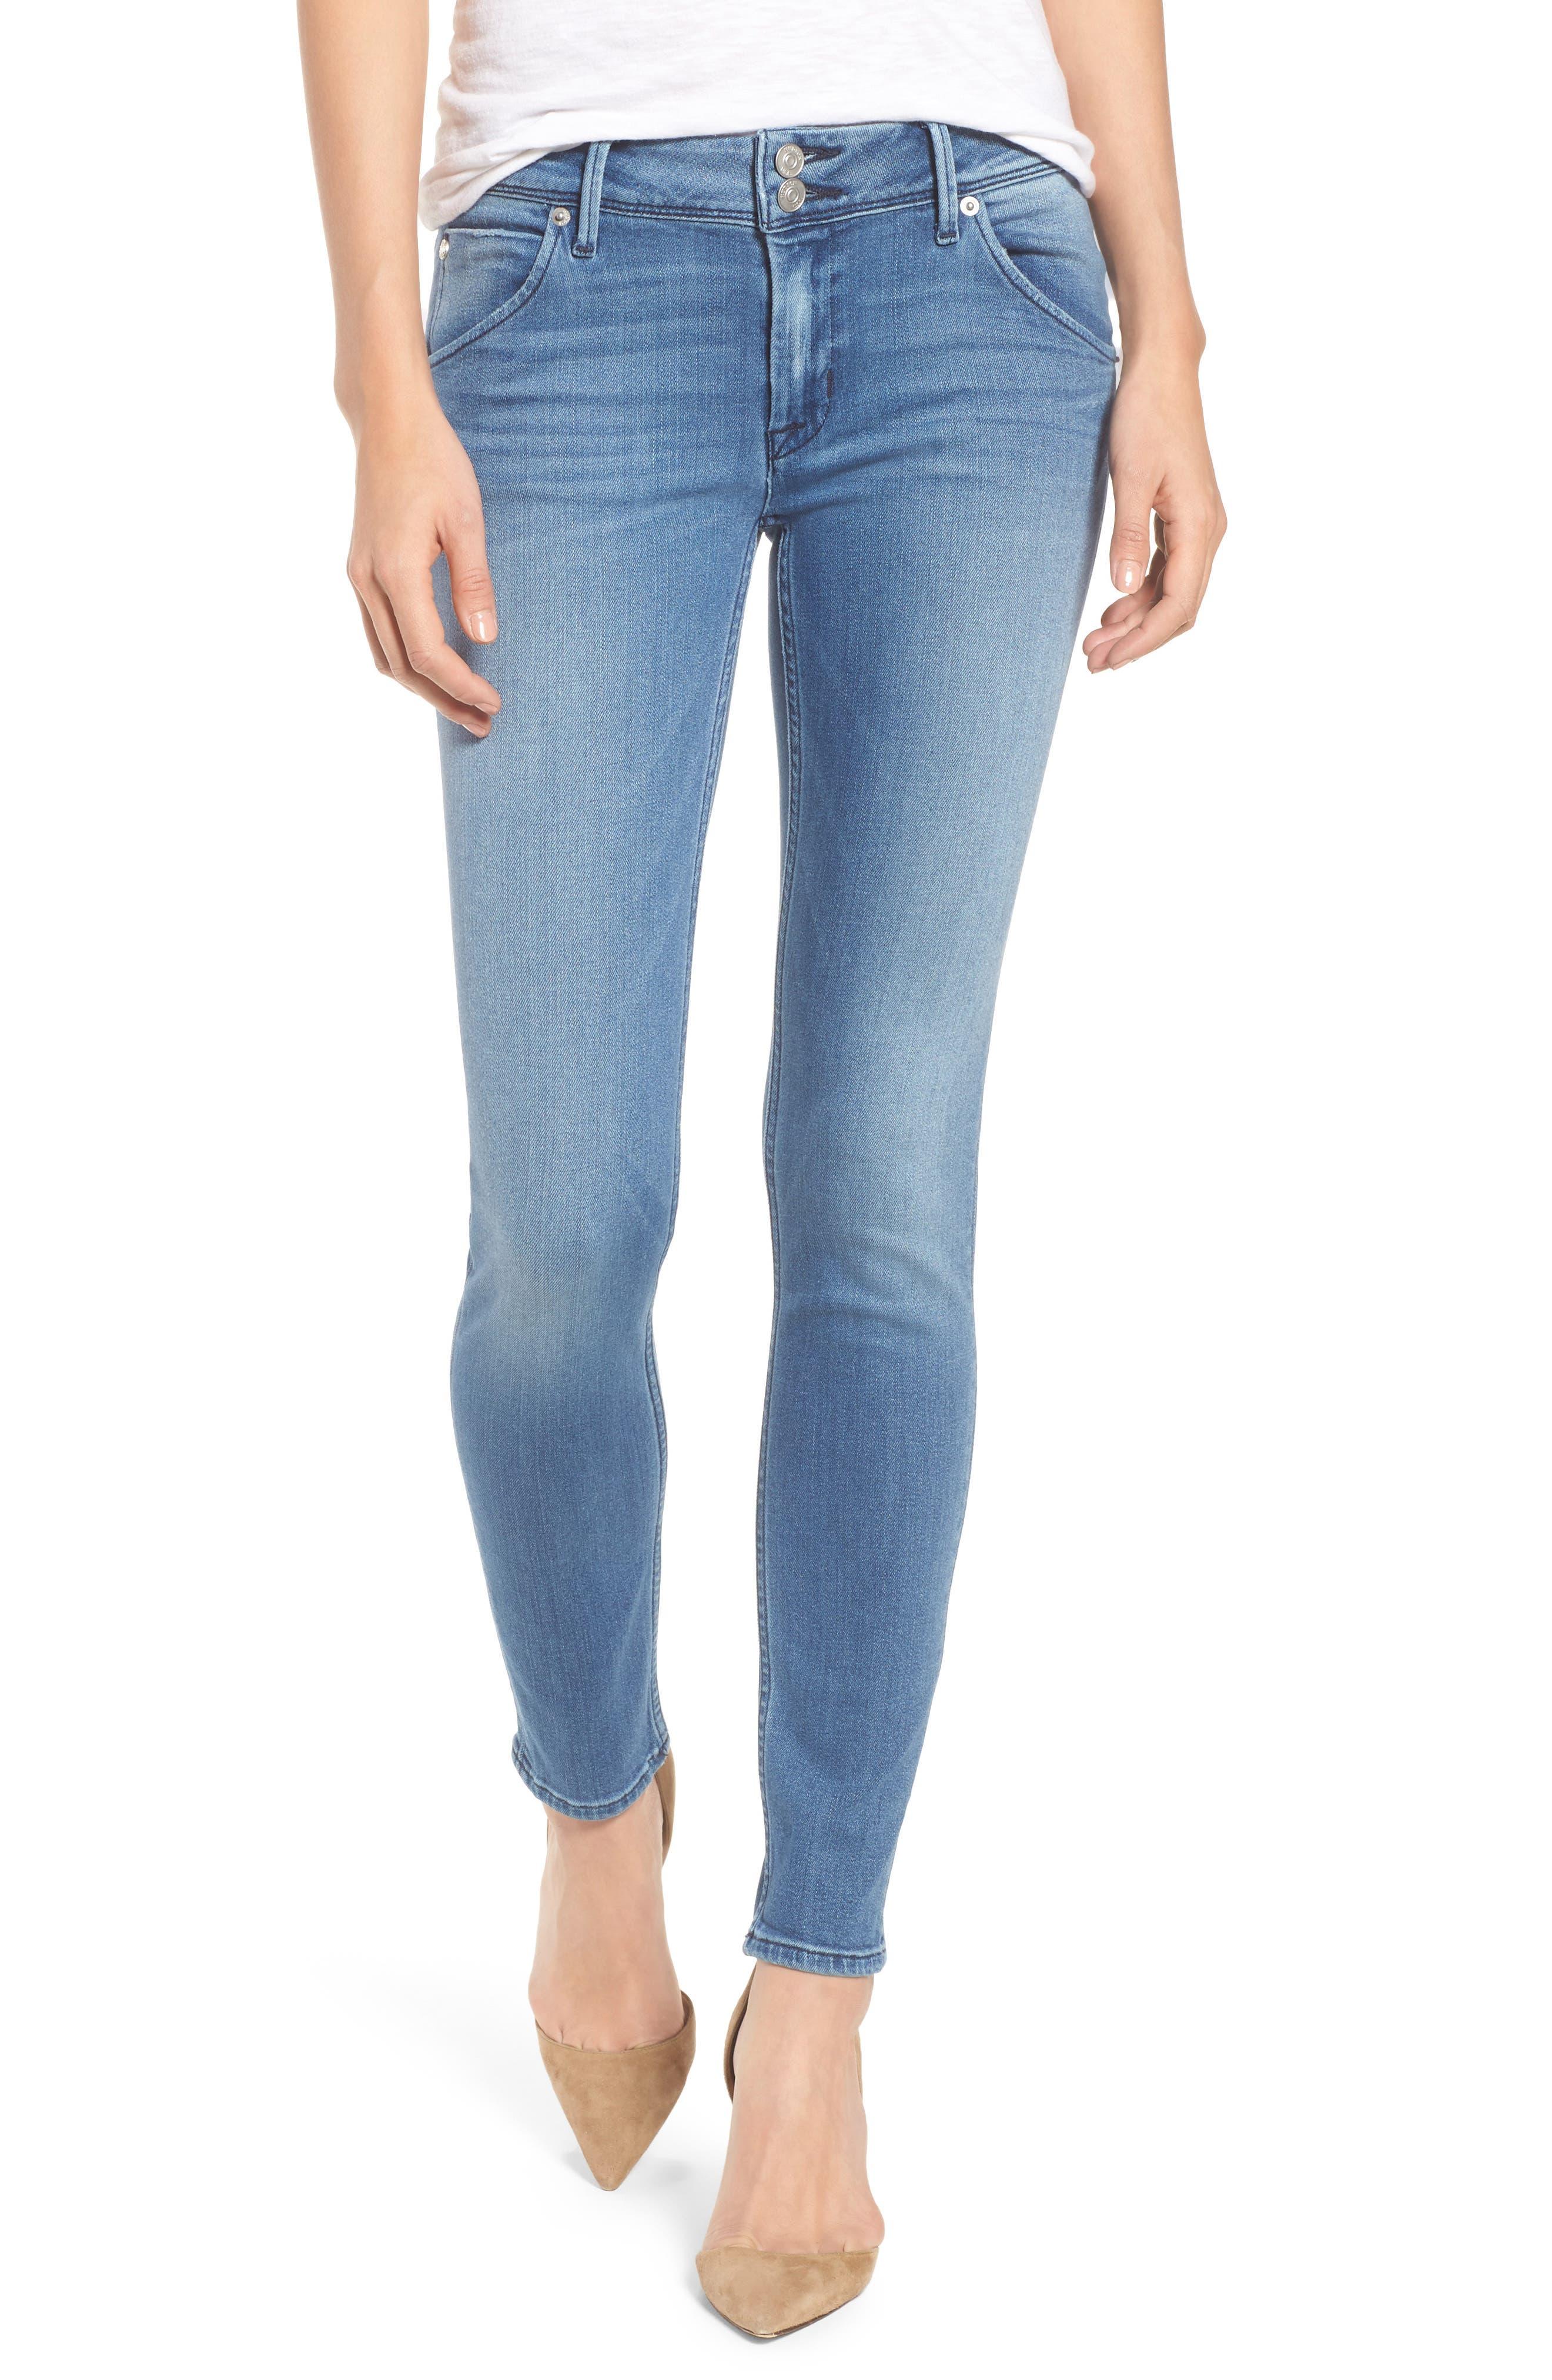 Alternate Image 1 Selected - Hudson Jeans Collin Skinny Jeans (Sentimental)